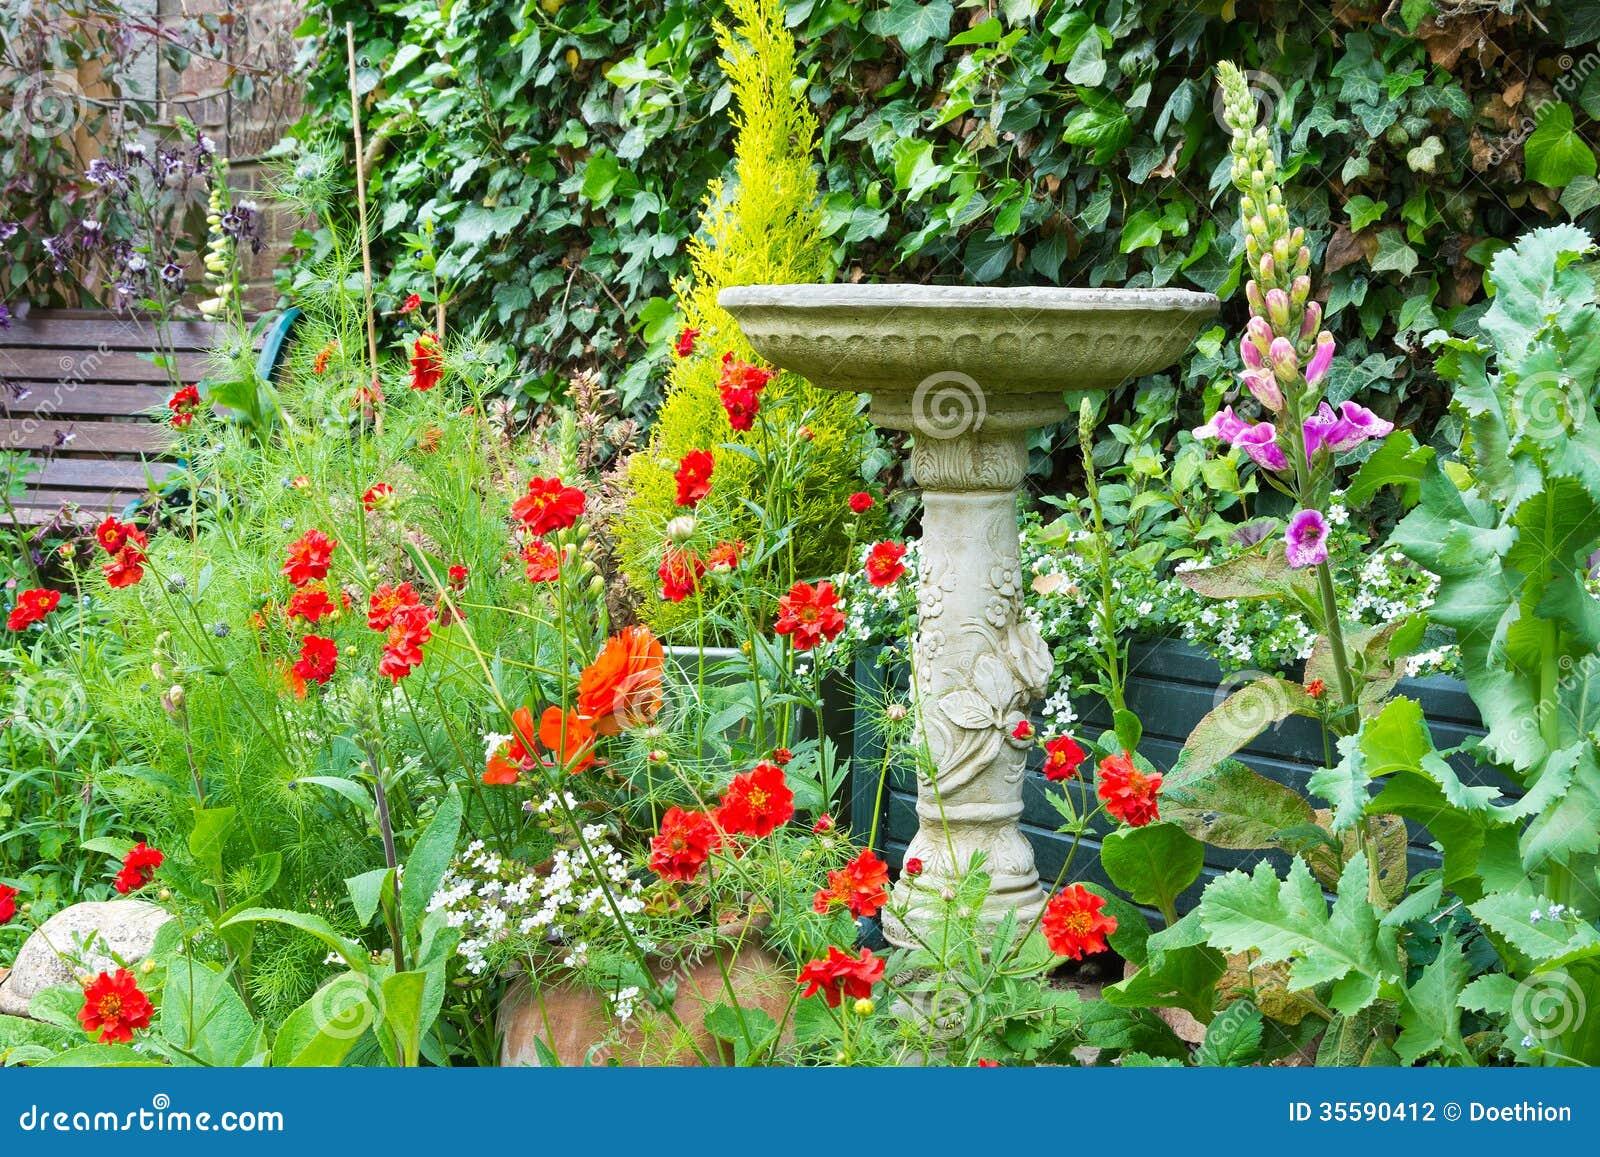 Bird Bath In Garden Clip Art